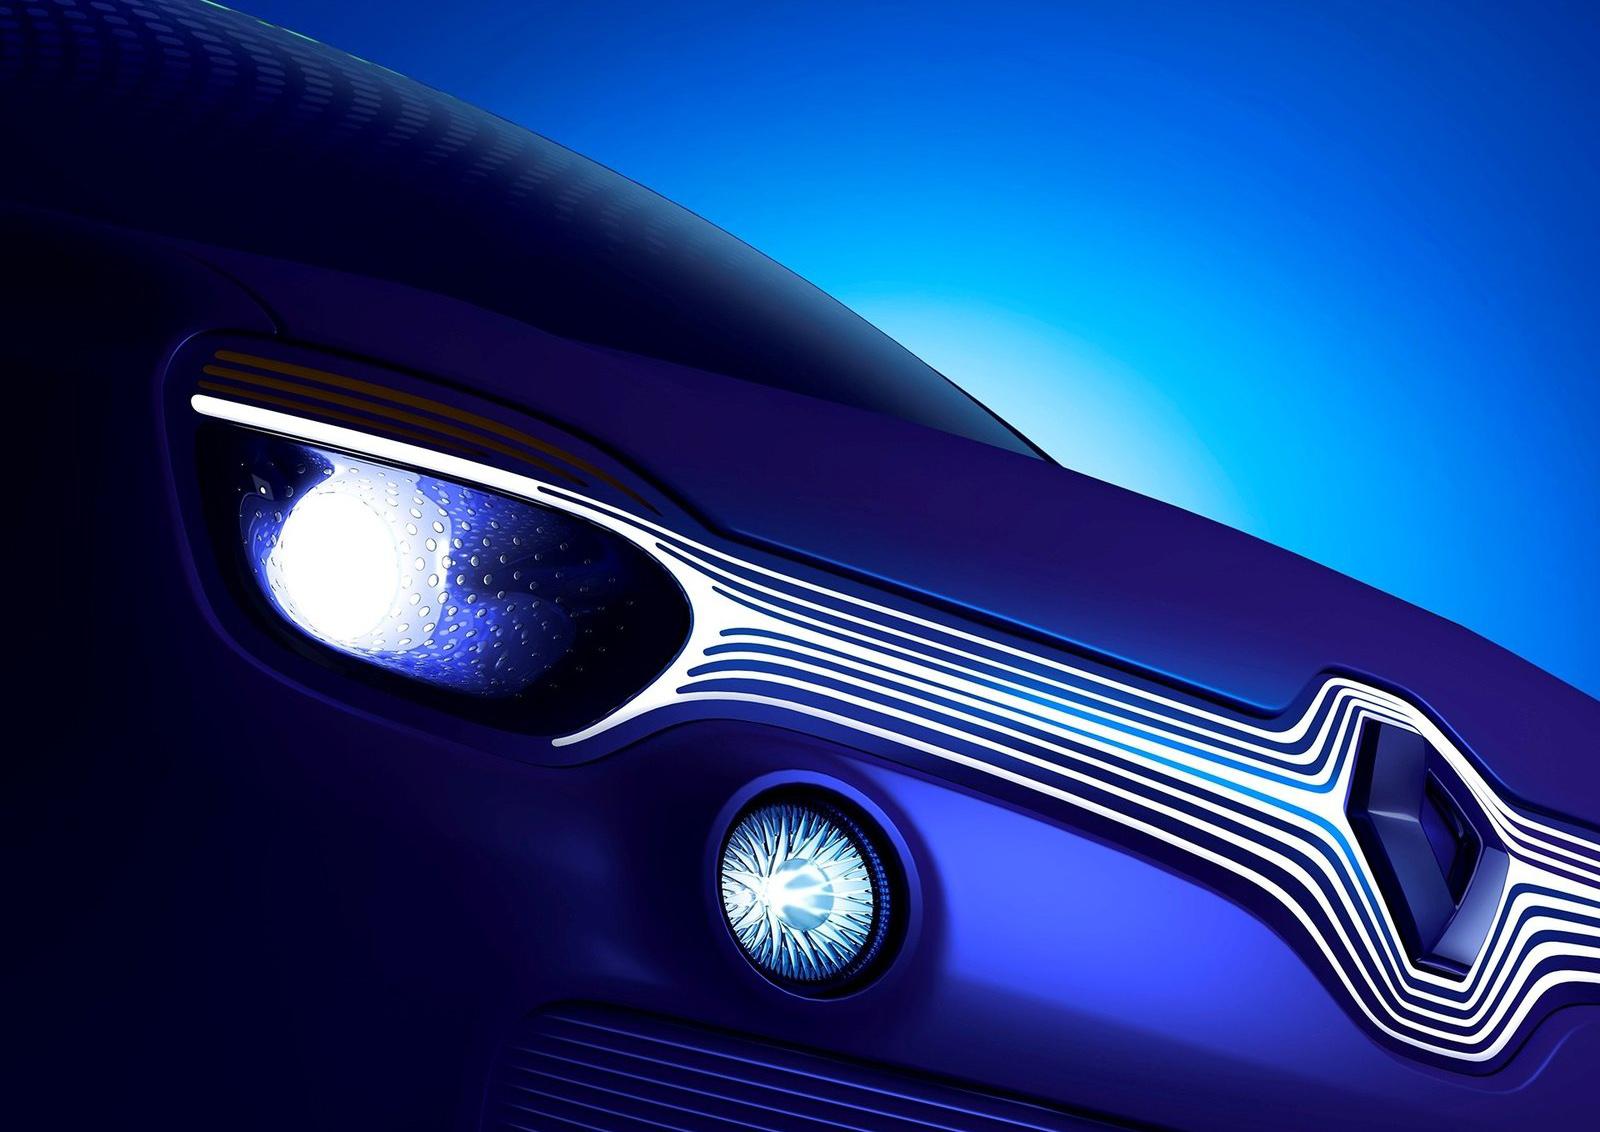 Renault-Twin-Z_Concept_2013_1600x1200_wallpaper_211